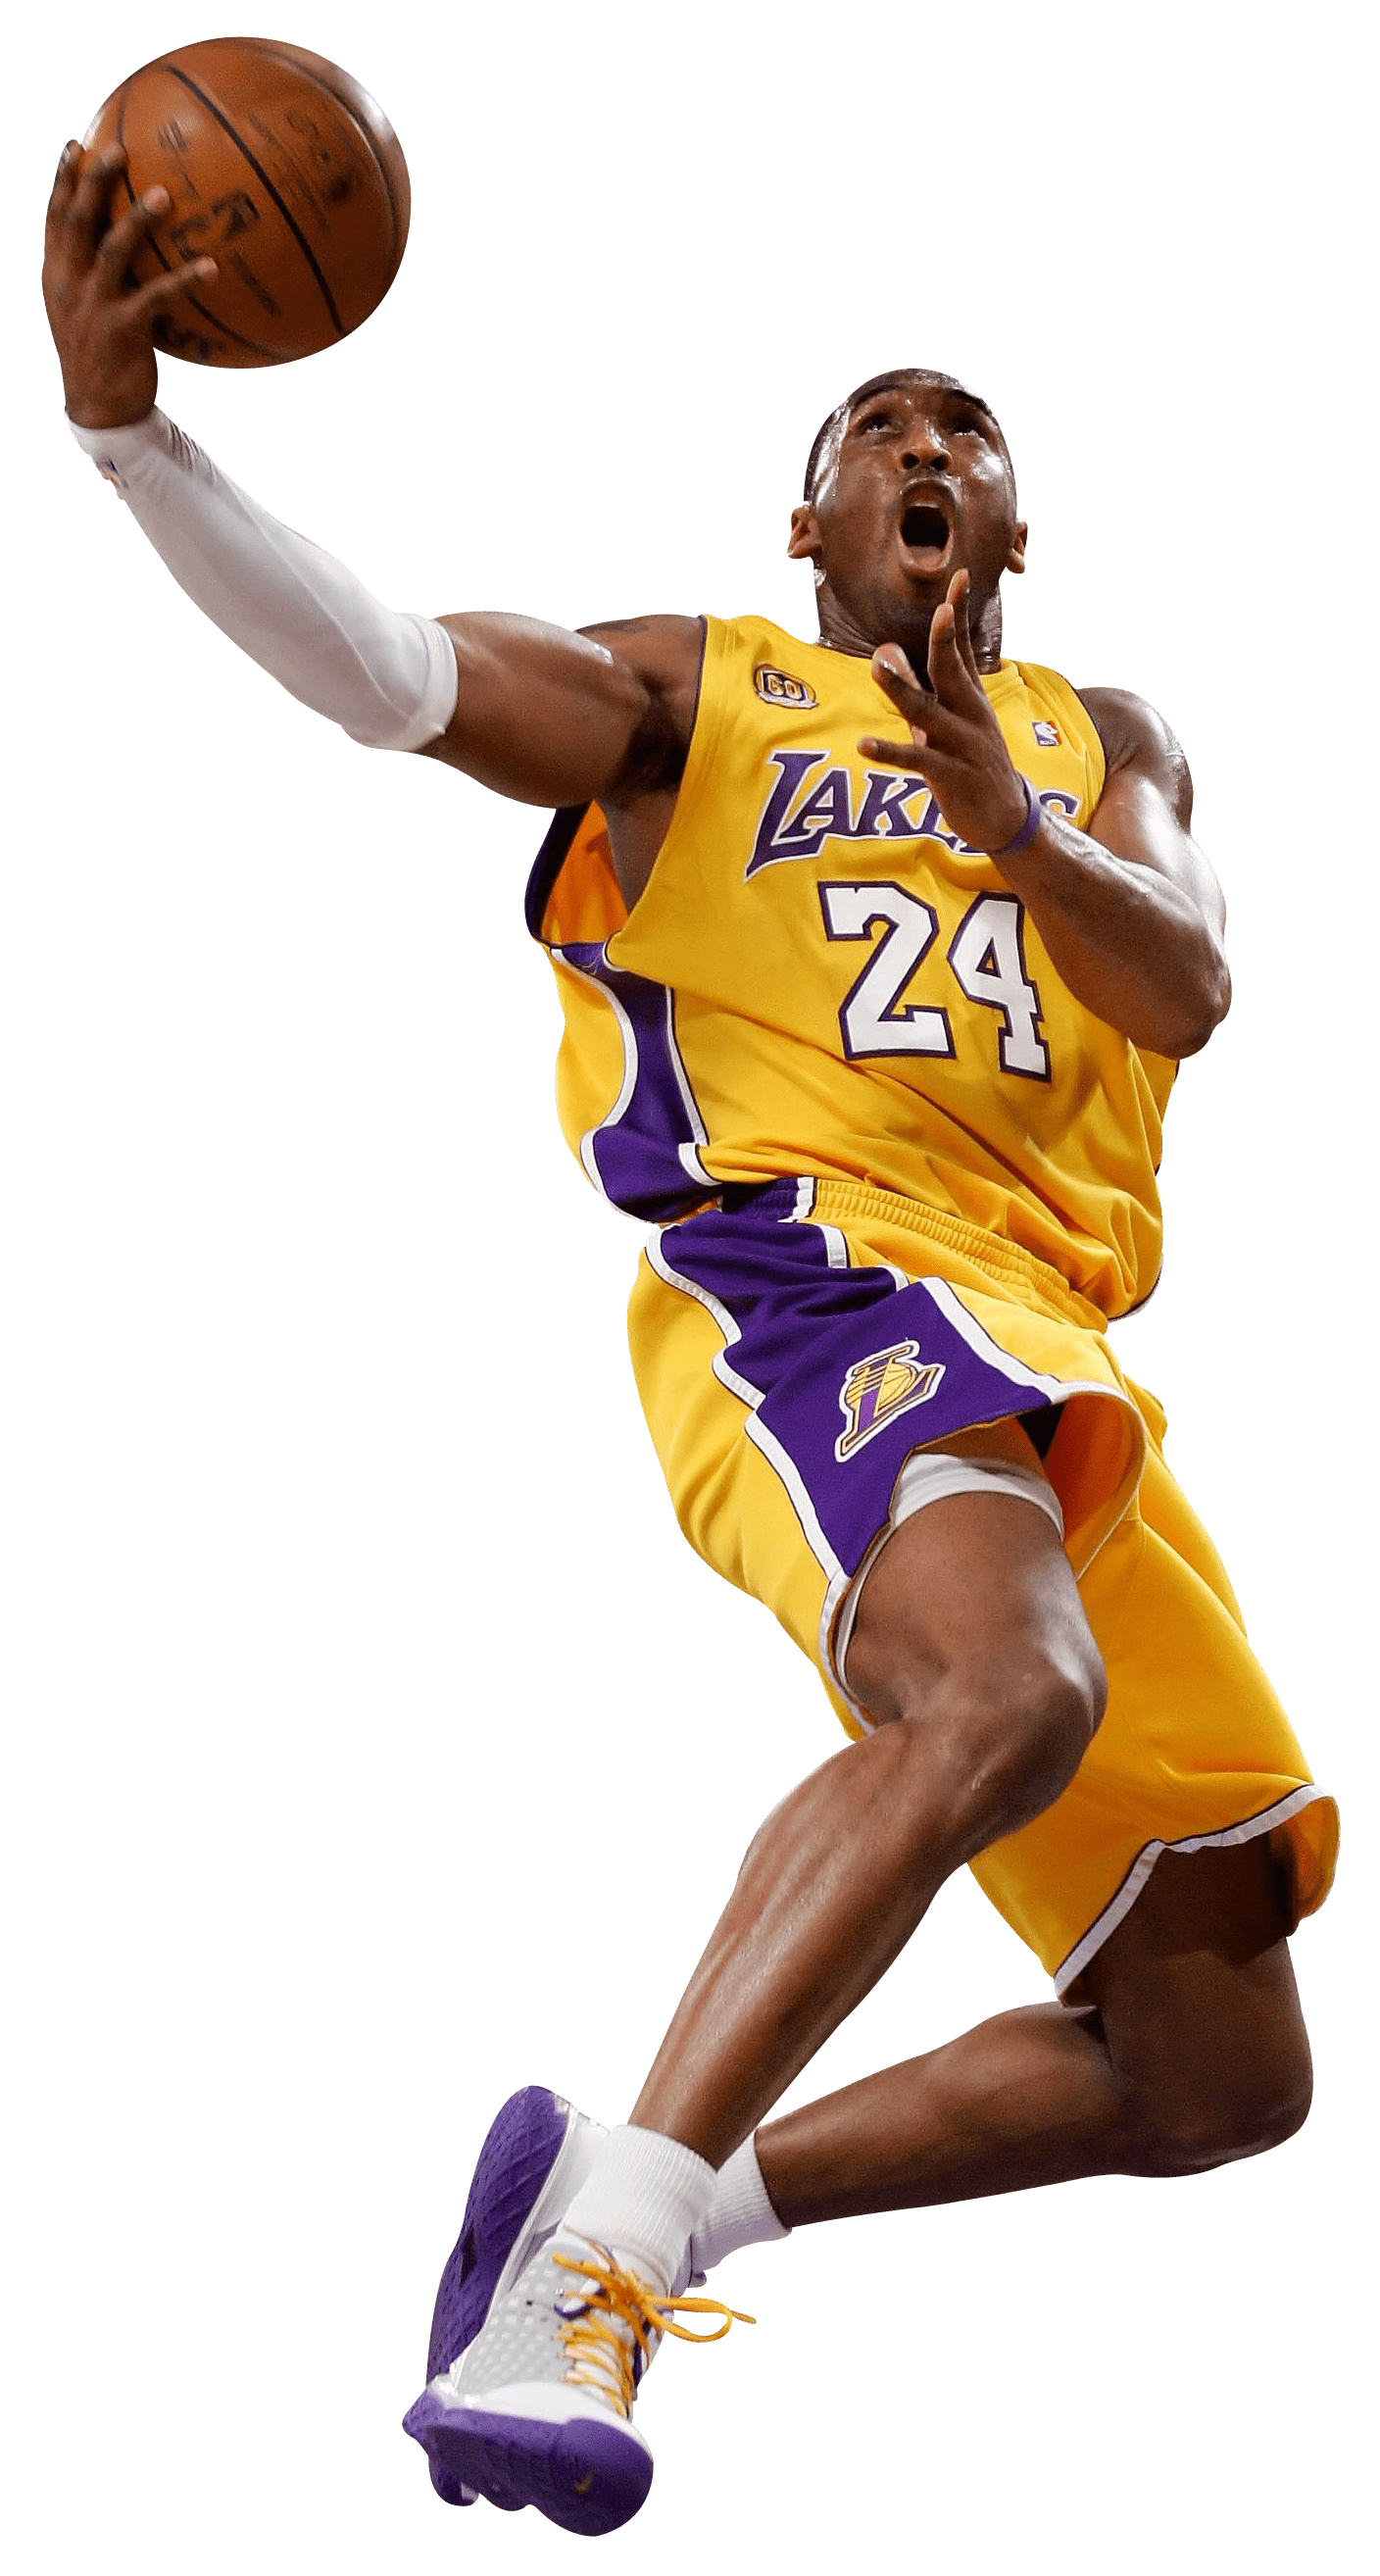 Kobe Bryant Dunk - Basketball Players PNG HD